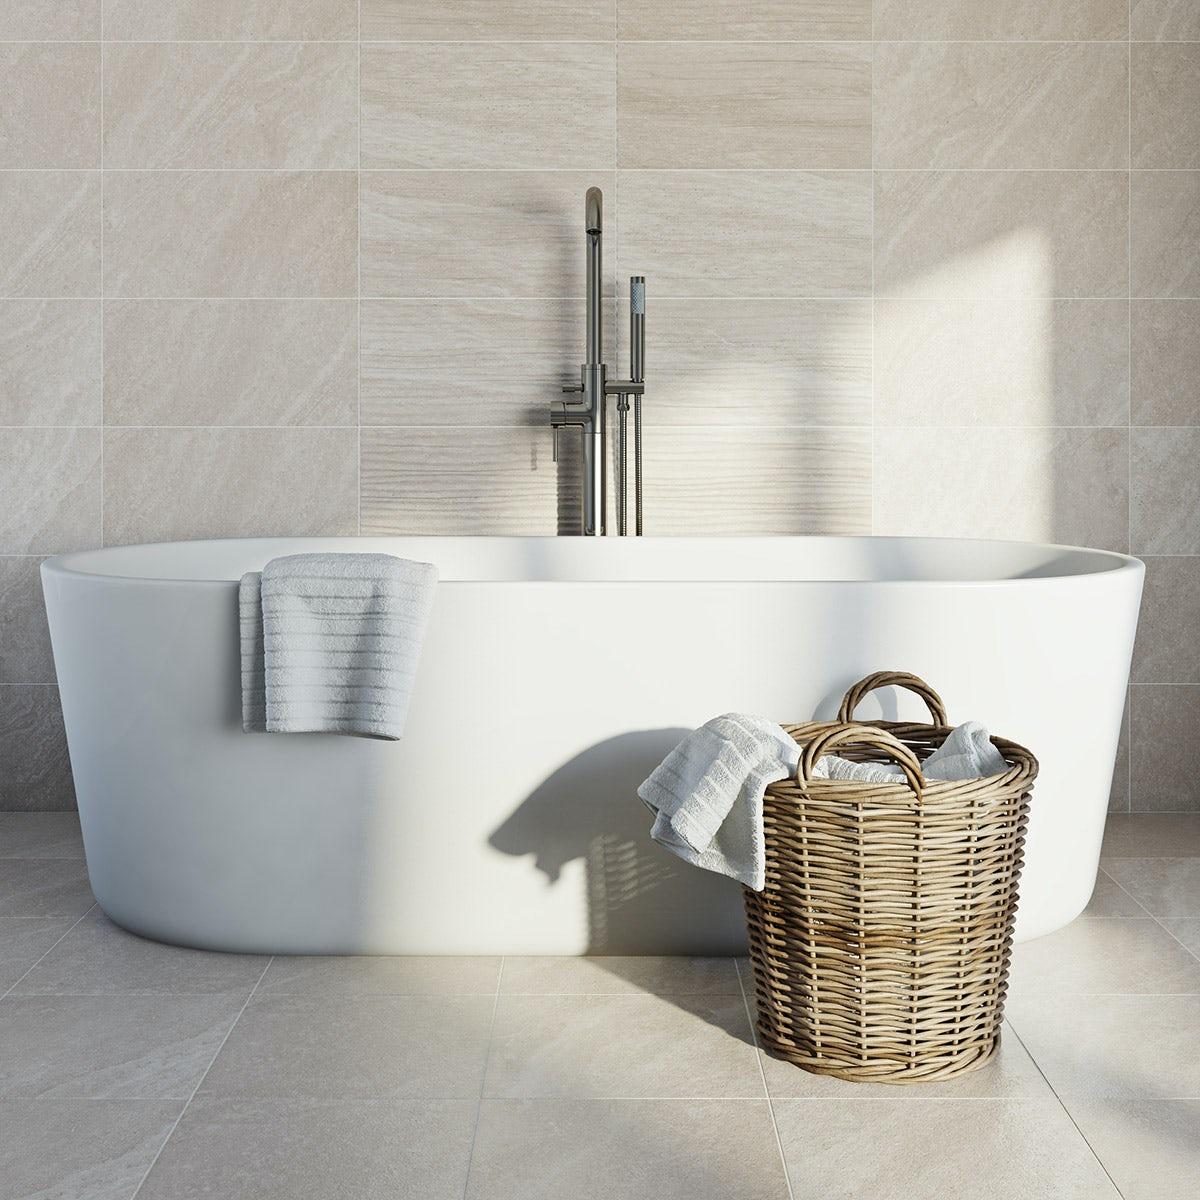 British Ceramic Tile Pumice grey wave matt tile 248mm x 498mm